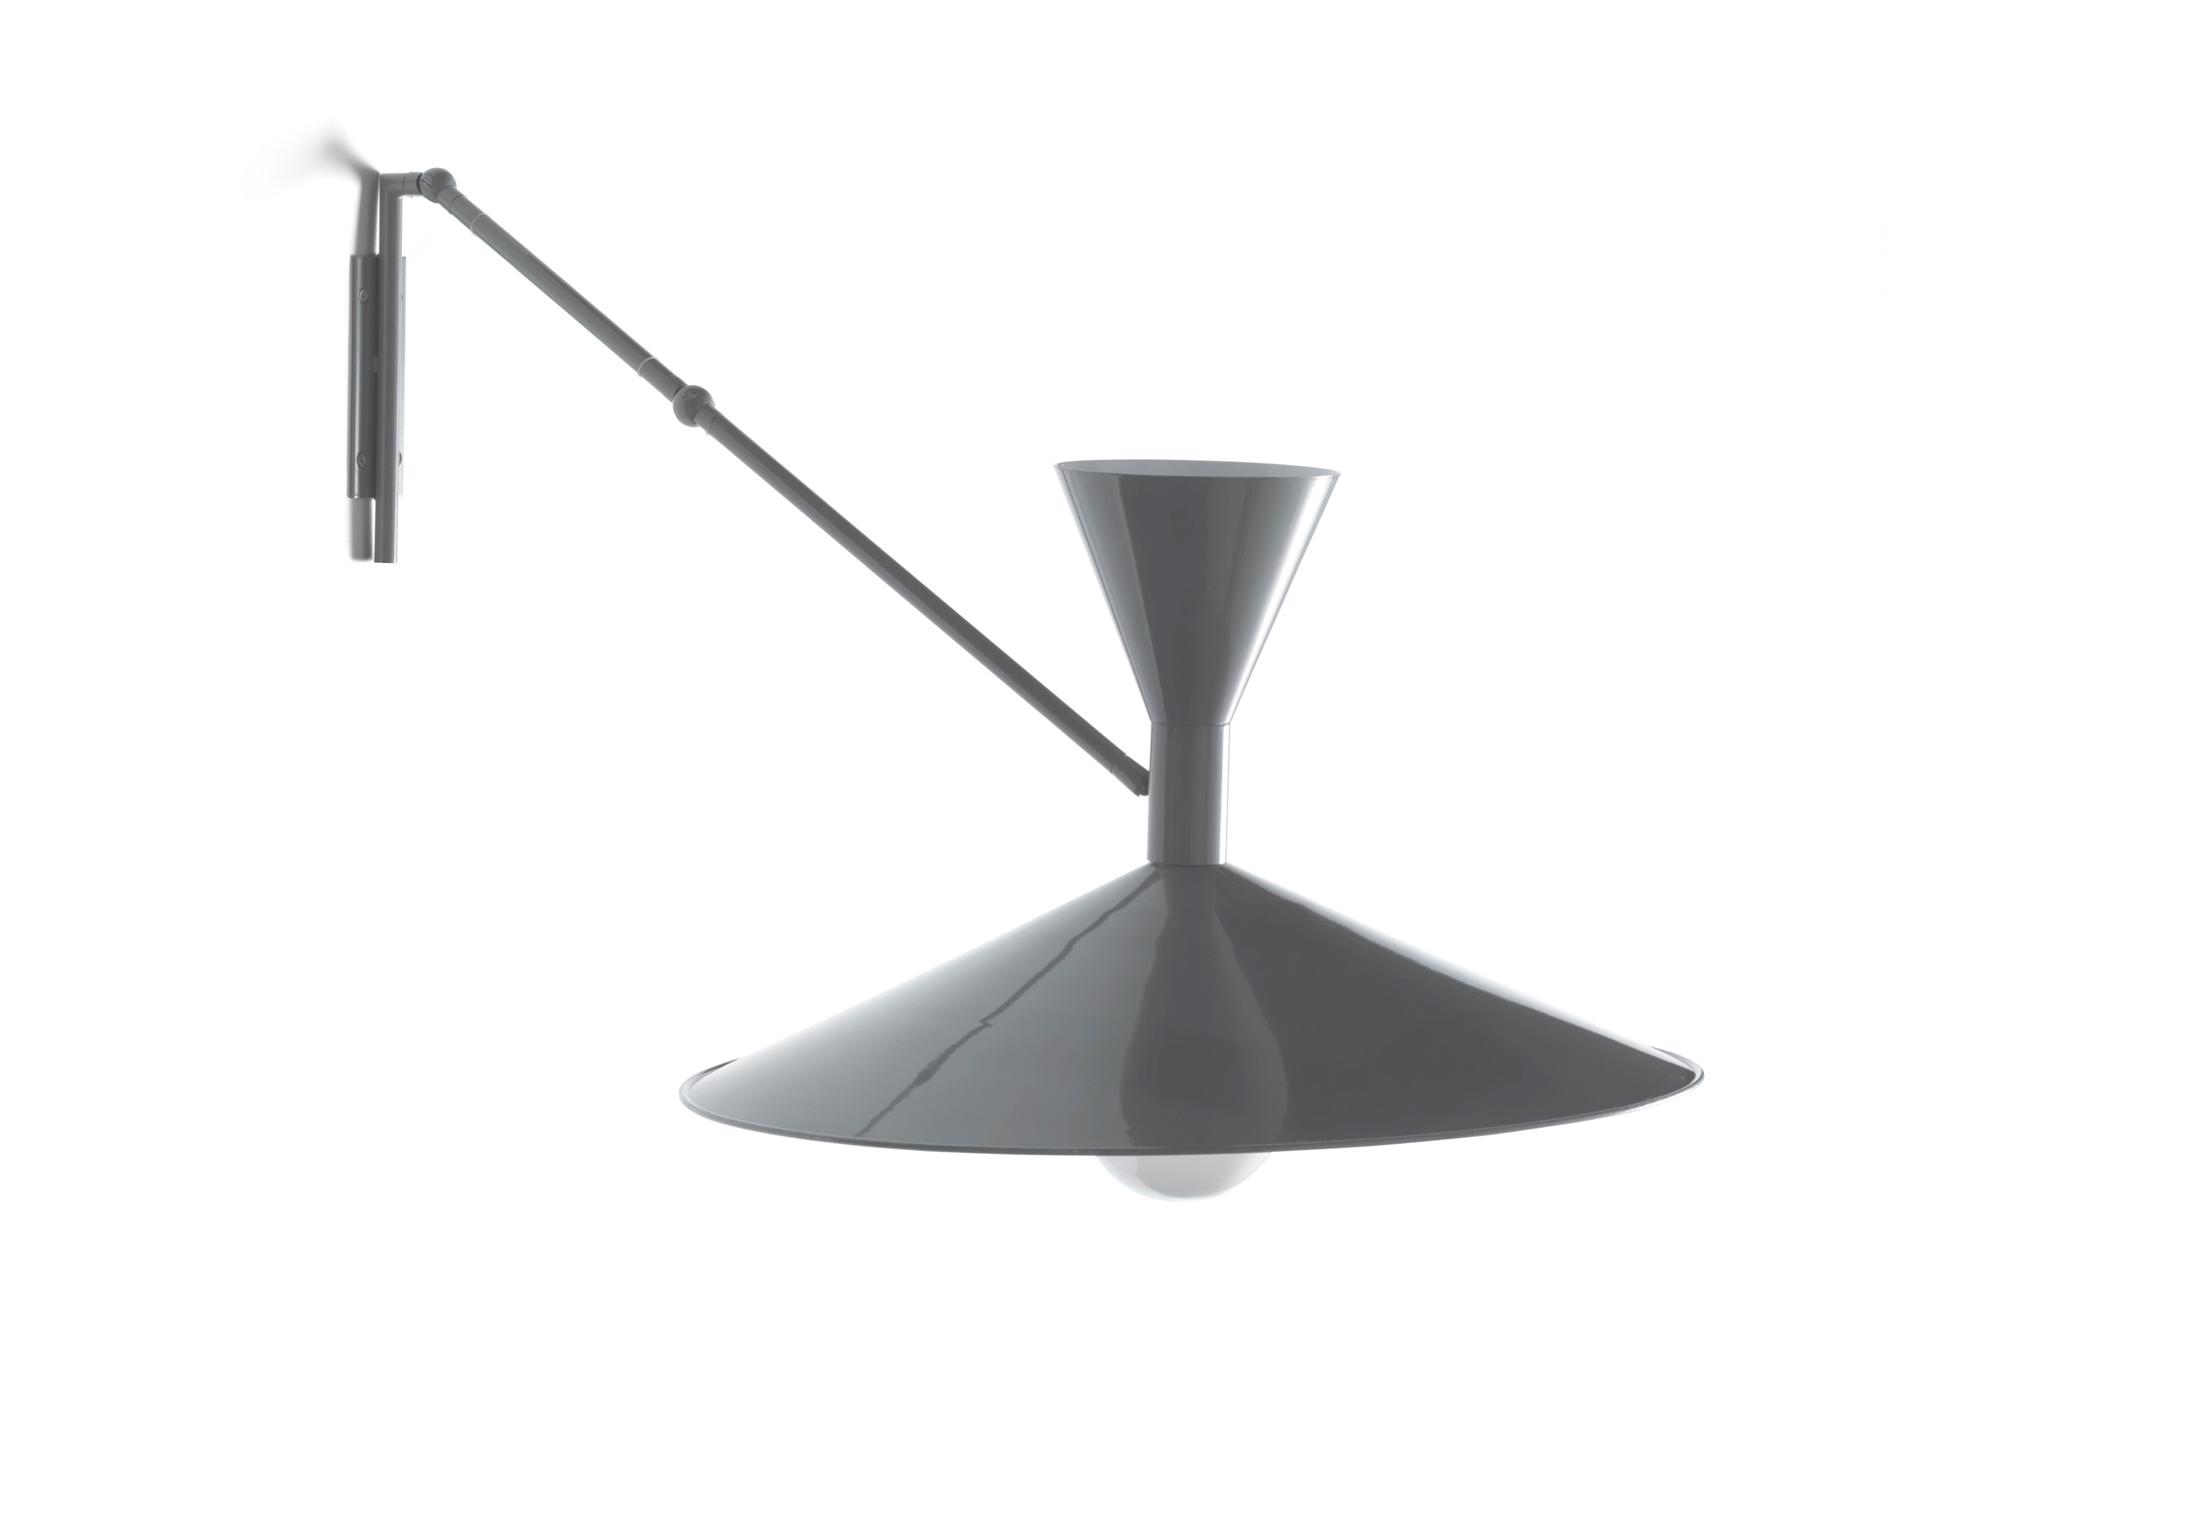 lampe-de-marseille-1 Spannende Lampen Frankfurt Am Main Dekorationen